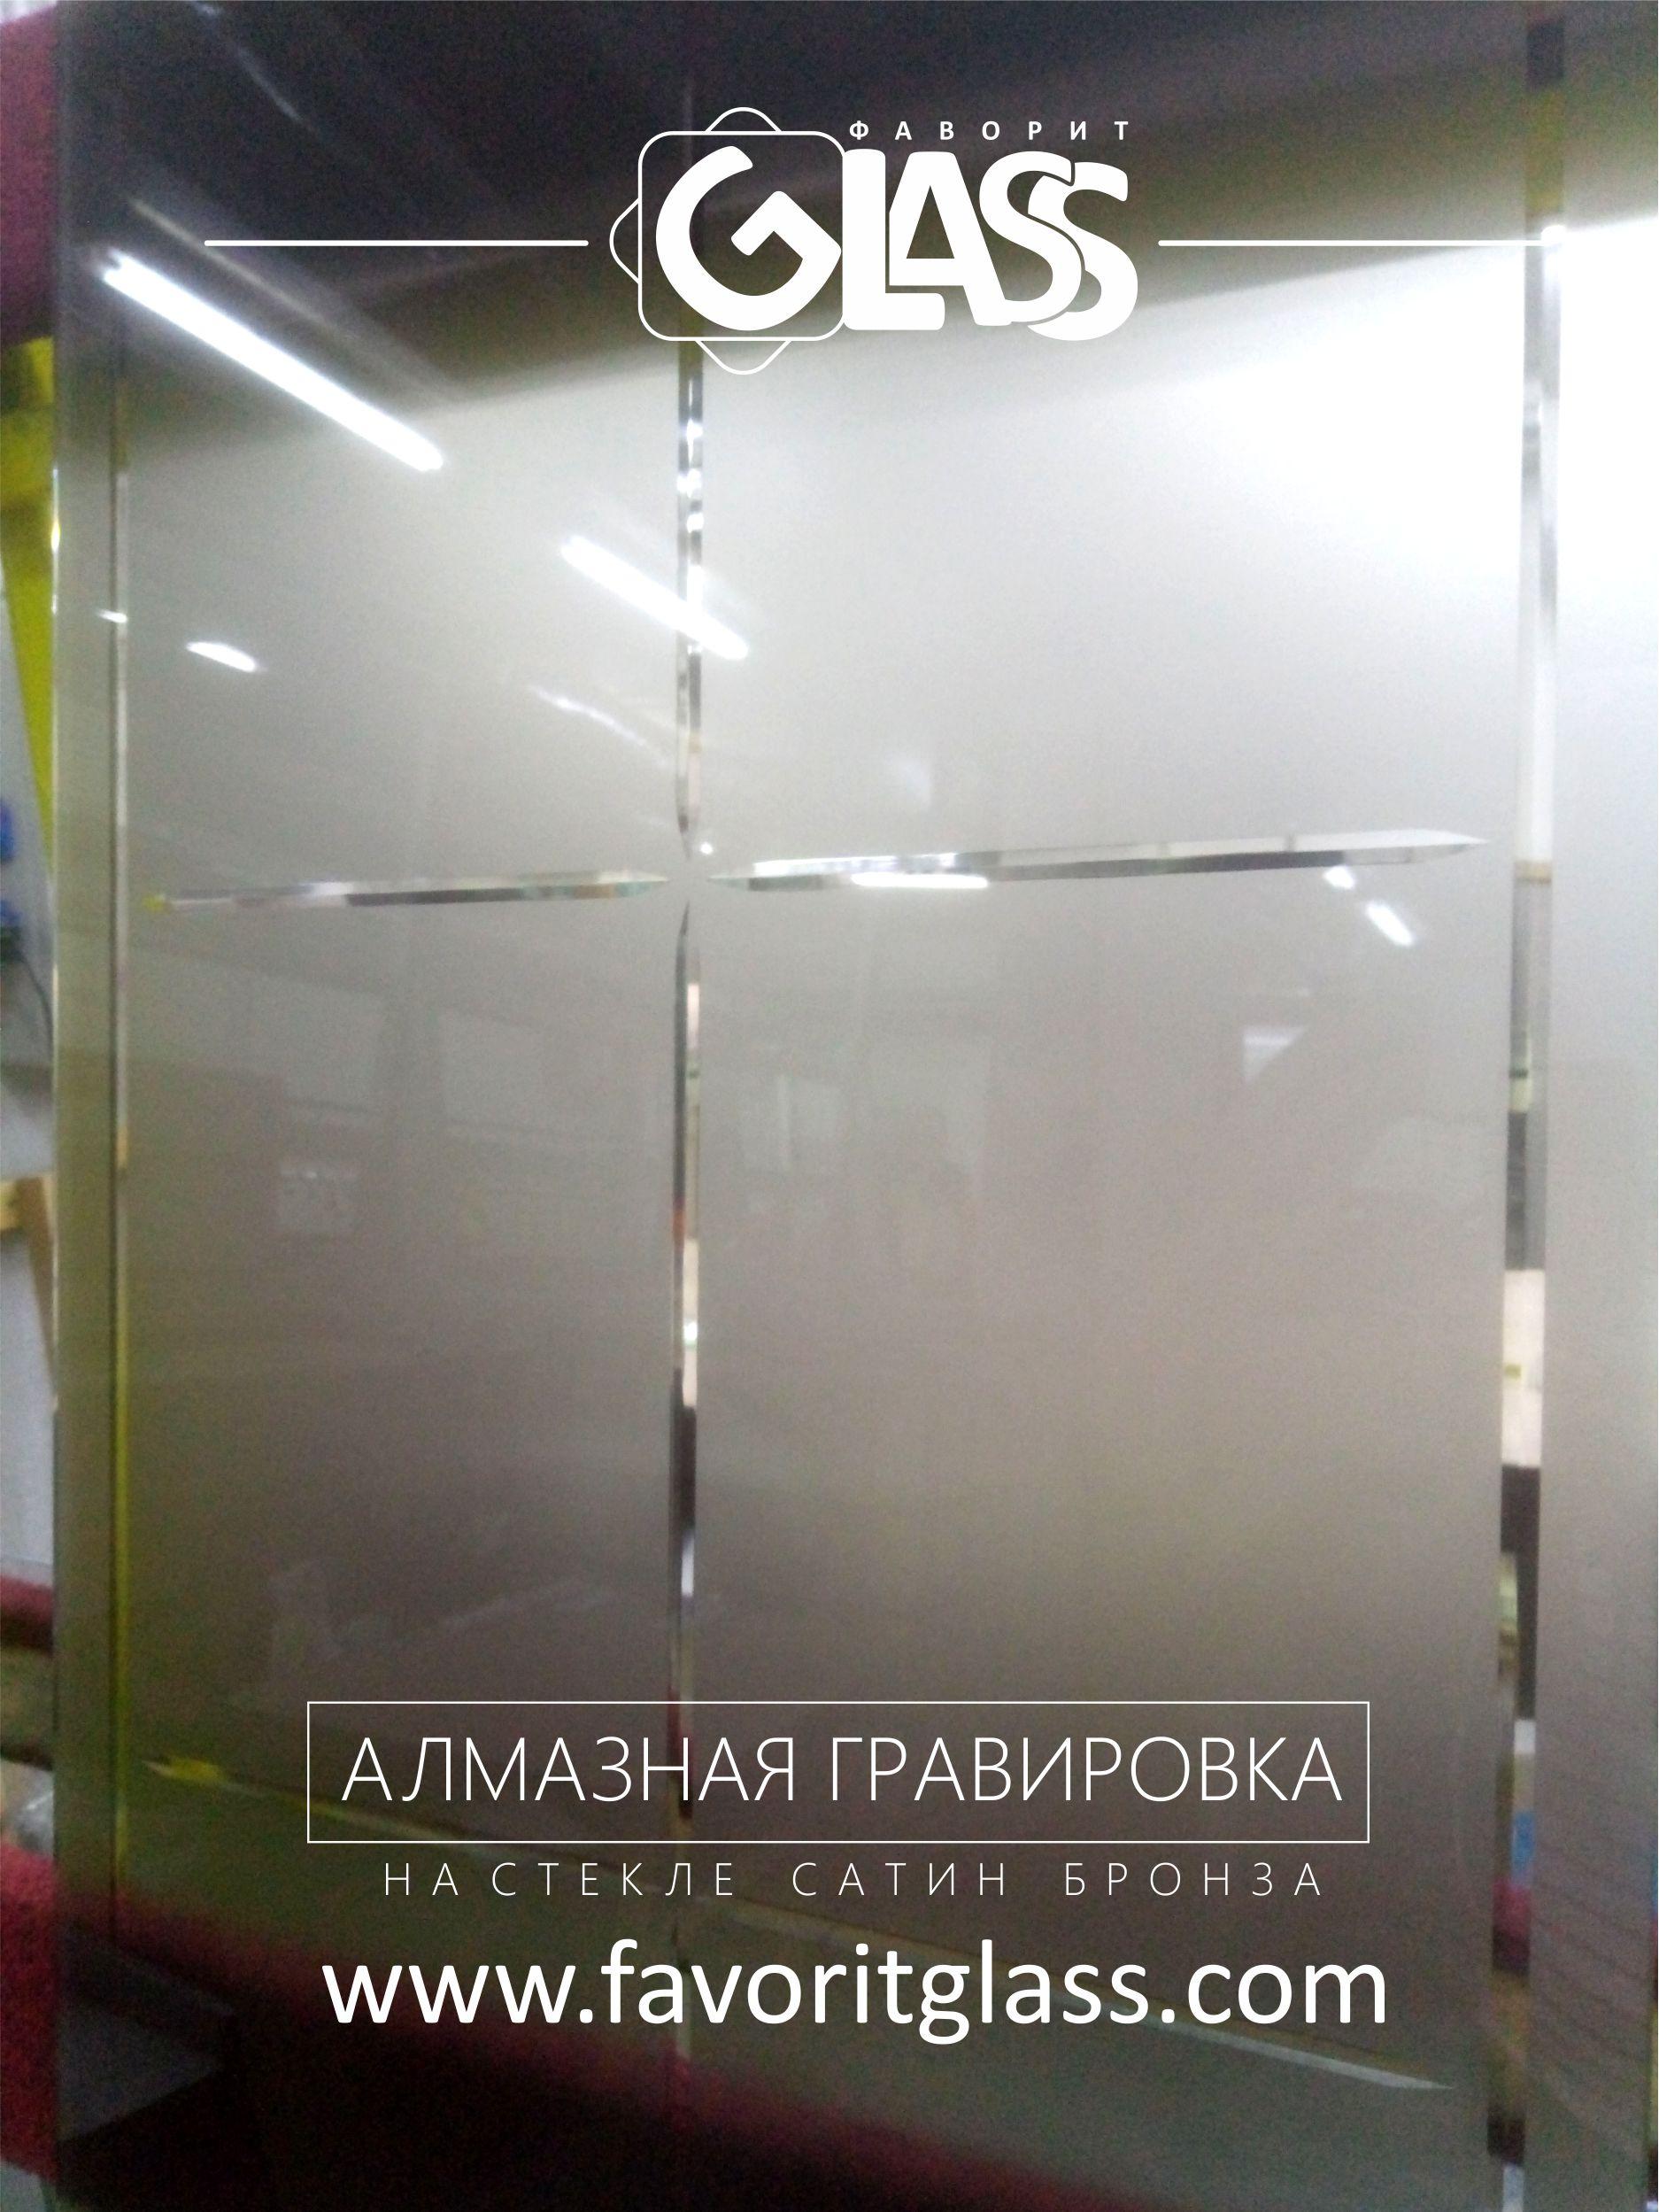 АЛМАЗНАЯ ГРАВИРОВКА НА стекле.jpg